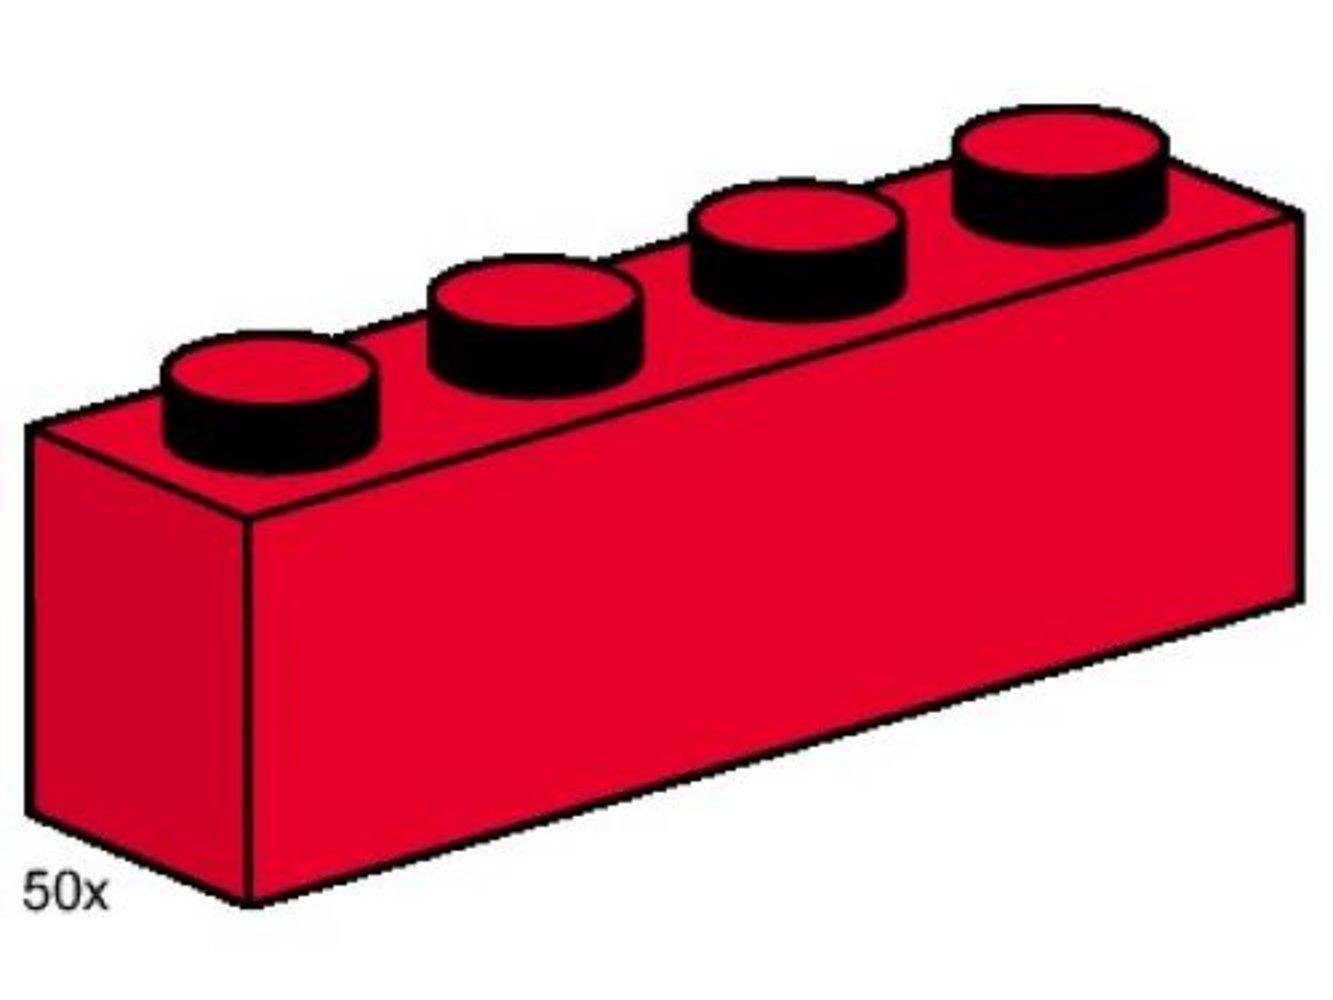 1 x 4 Red Bricks